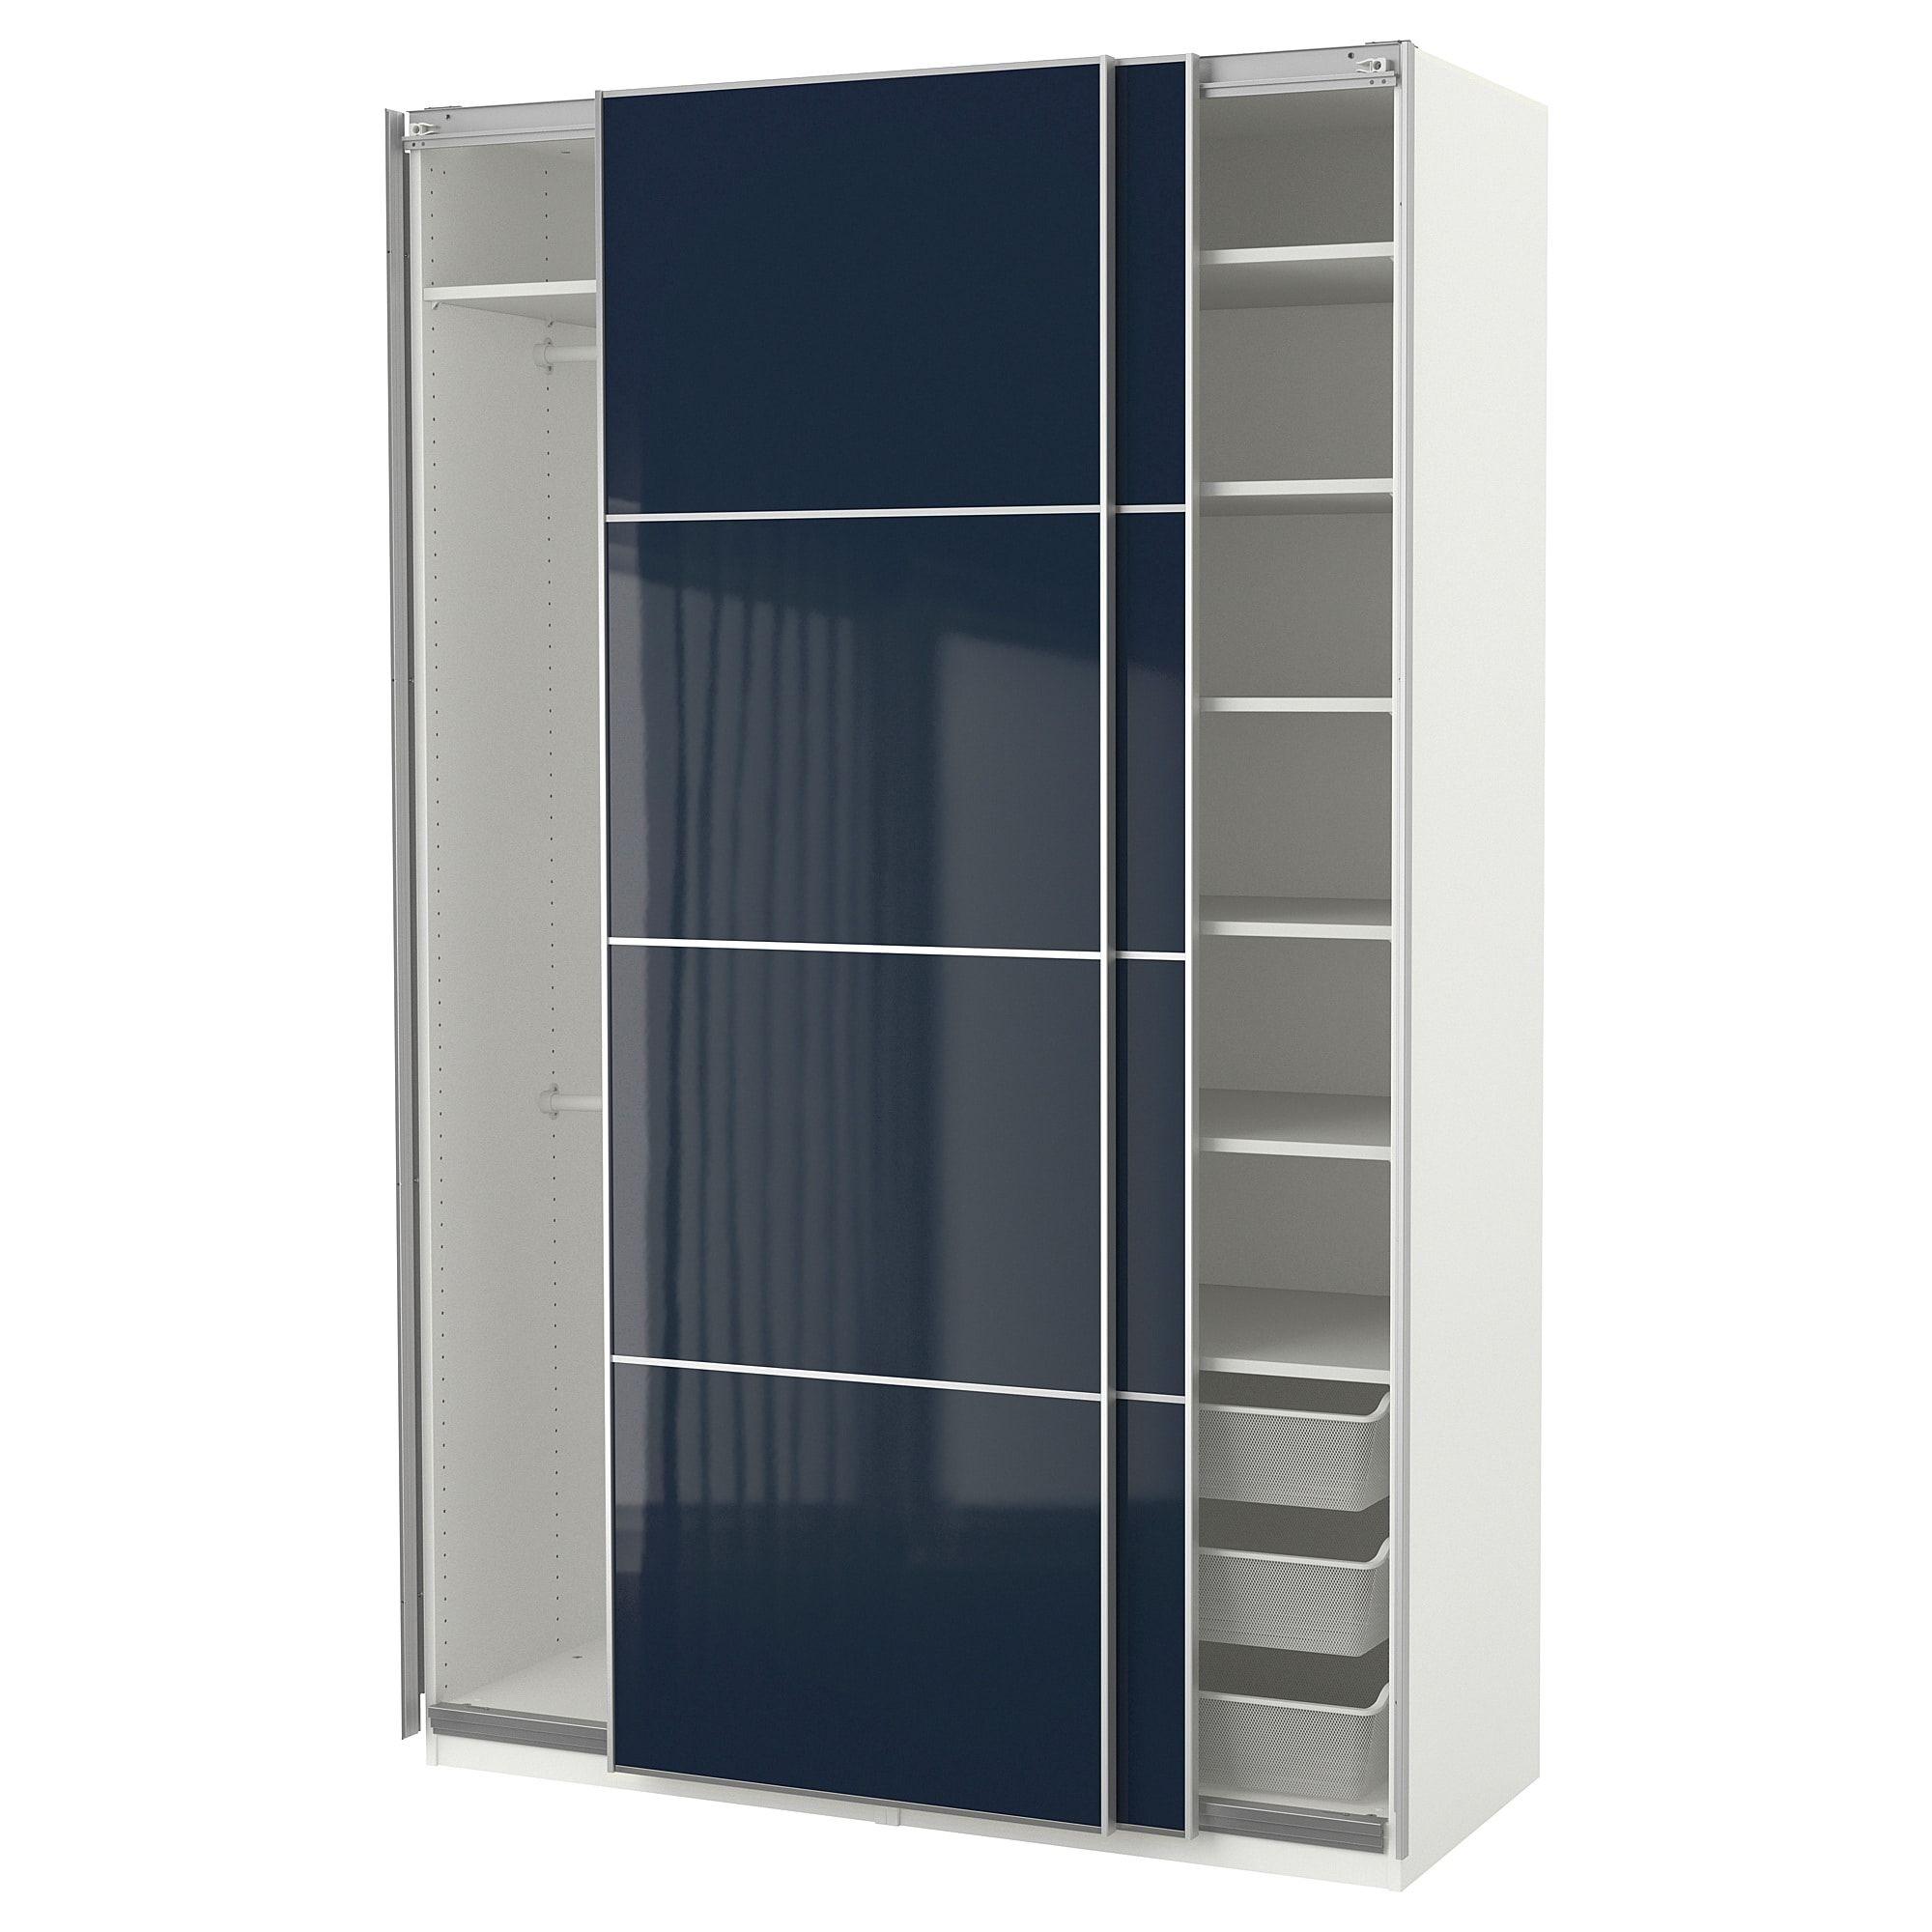 US Furniture and Home Furnishings Ikea wardrobe, Pax